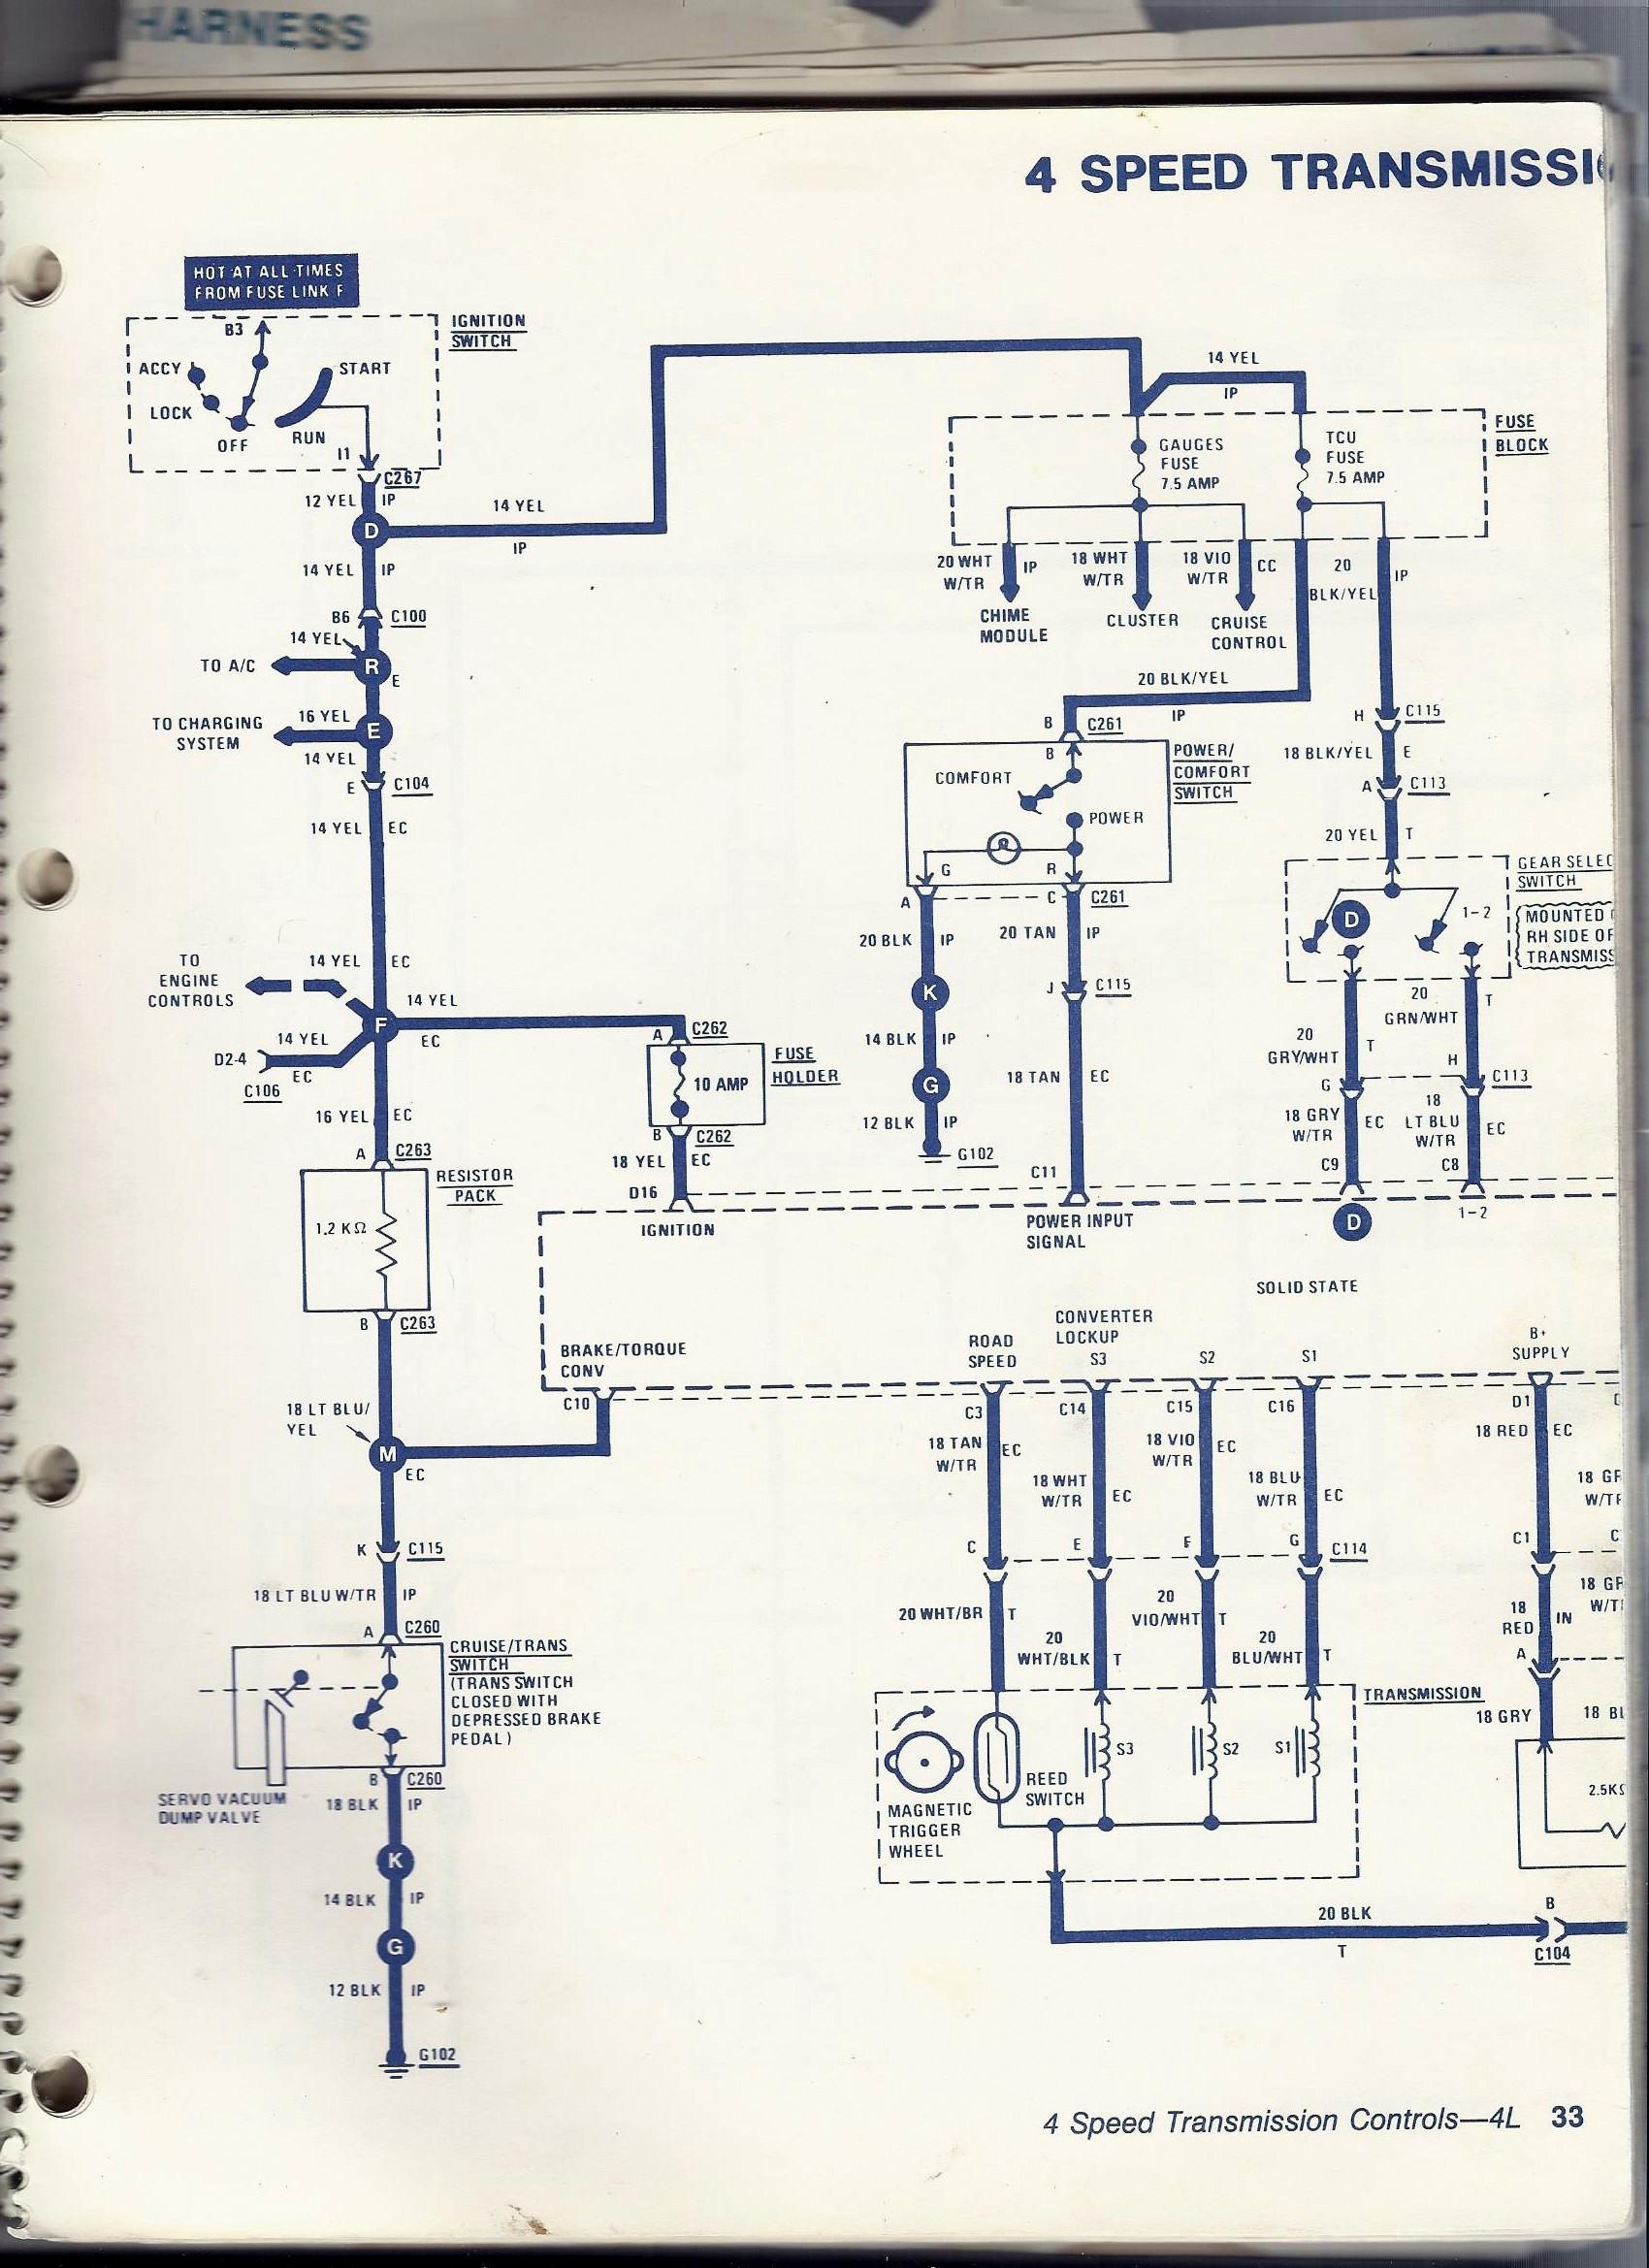 hid badge readers wiring diagram dolgular com wiegand card reader wiring diagram  Card Reader Wiring-Diagram Gilbarco Door Access Control Wiring Diagram Software Wiring Diagram